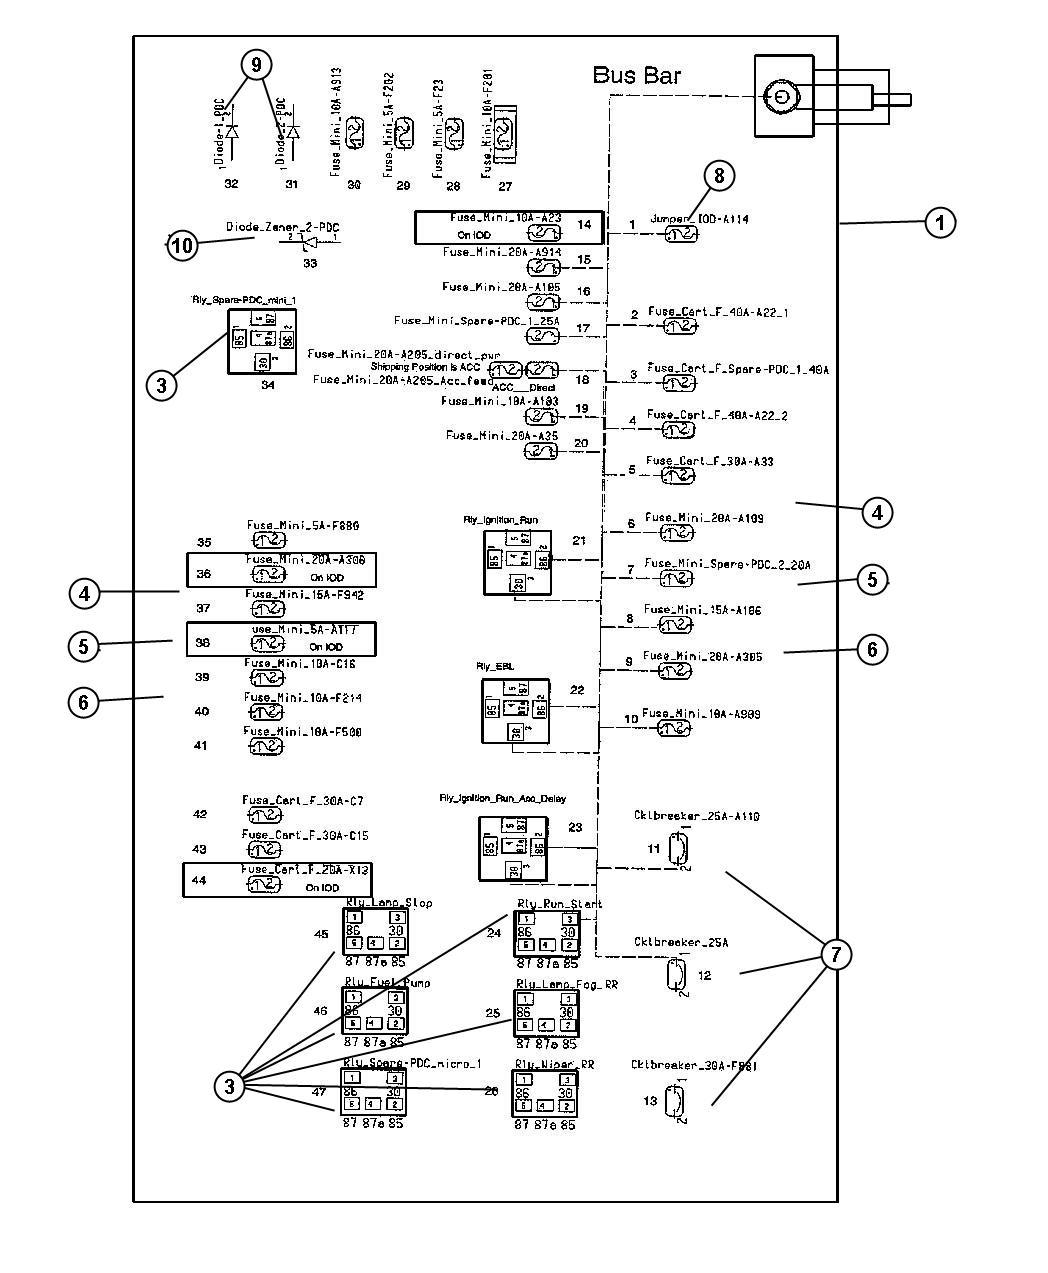 DIAGRAM] Fuse Panel Diagram 2006 Chrysler 300 FULL Version HD Quality Chrysler  300 - LADDERDIAGRAM71.SANVITOJAZZ.ITsanvitojazz.it